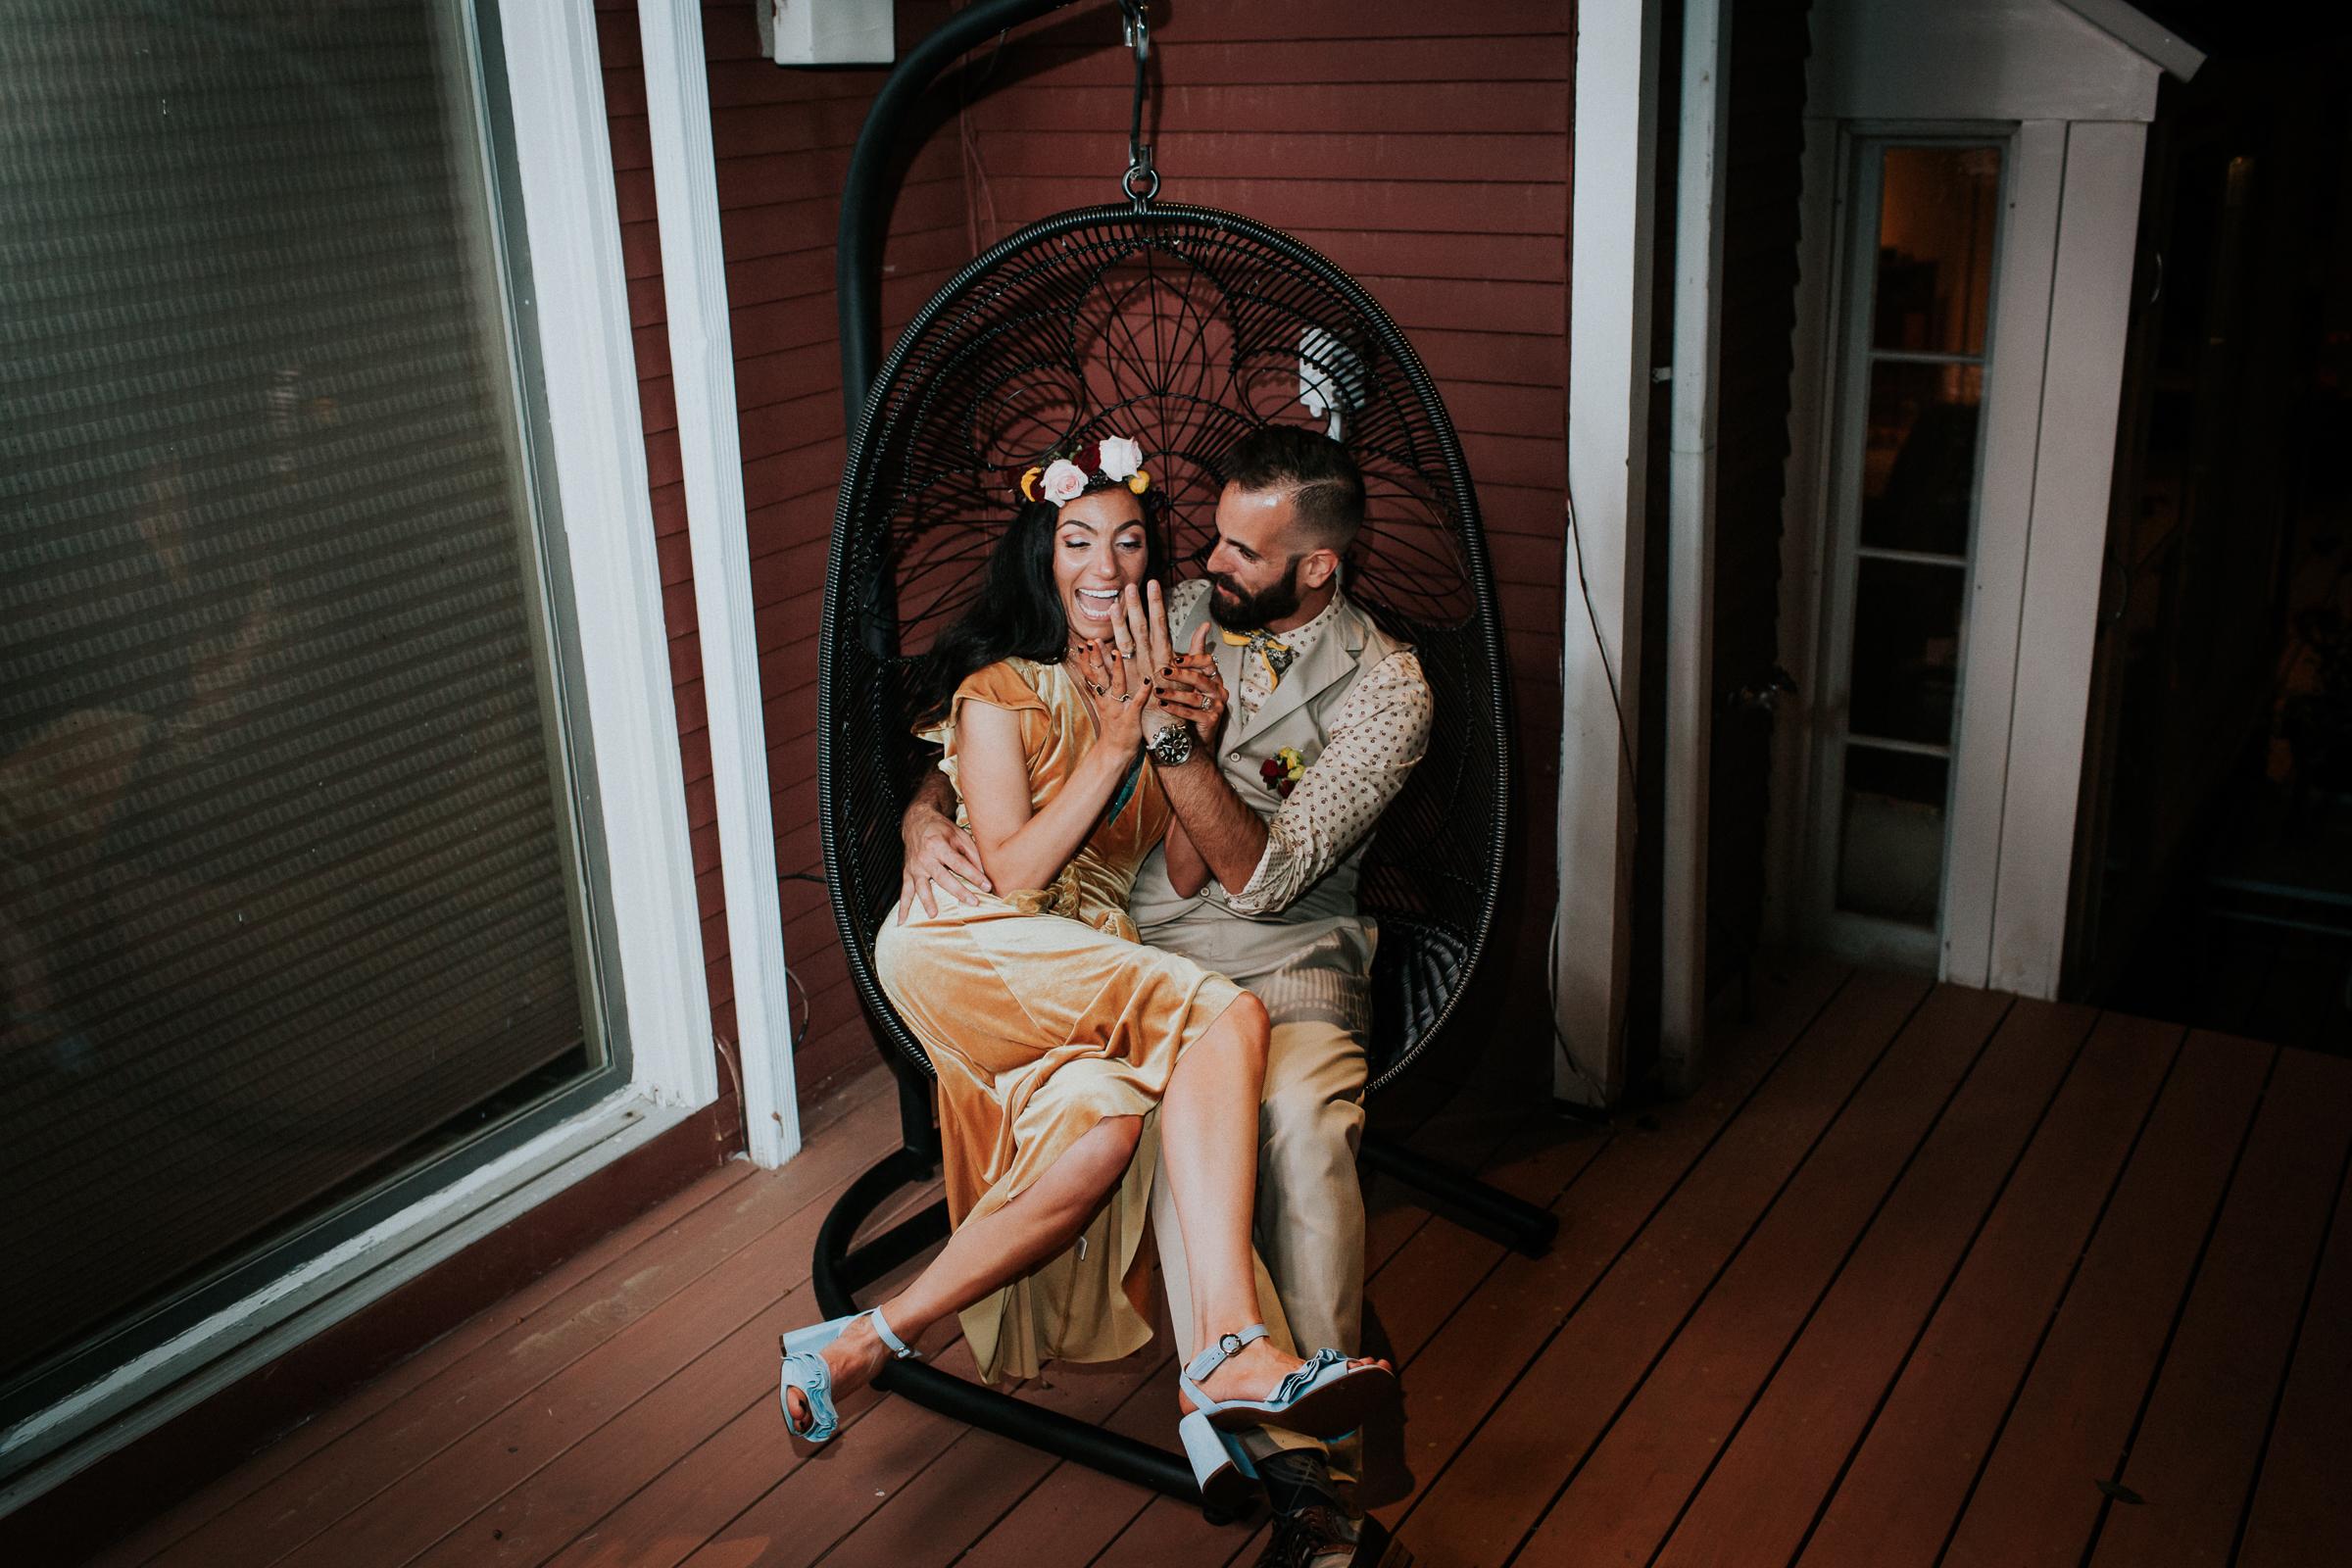 New-York-Documentary-Wedding-Photography-Best-Of-2017-by-Elvira-Kalviste-Photography-76.jpg